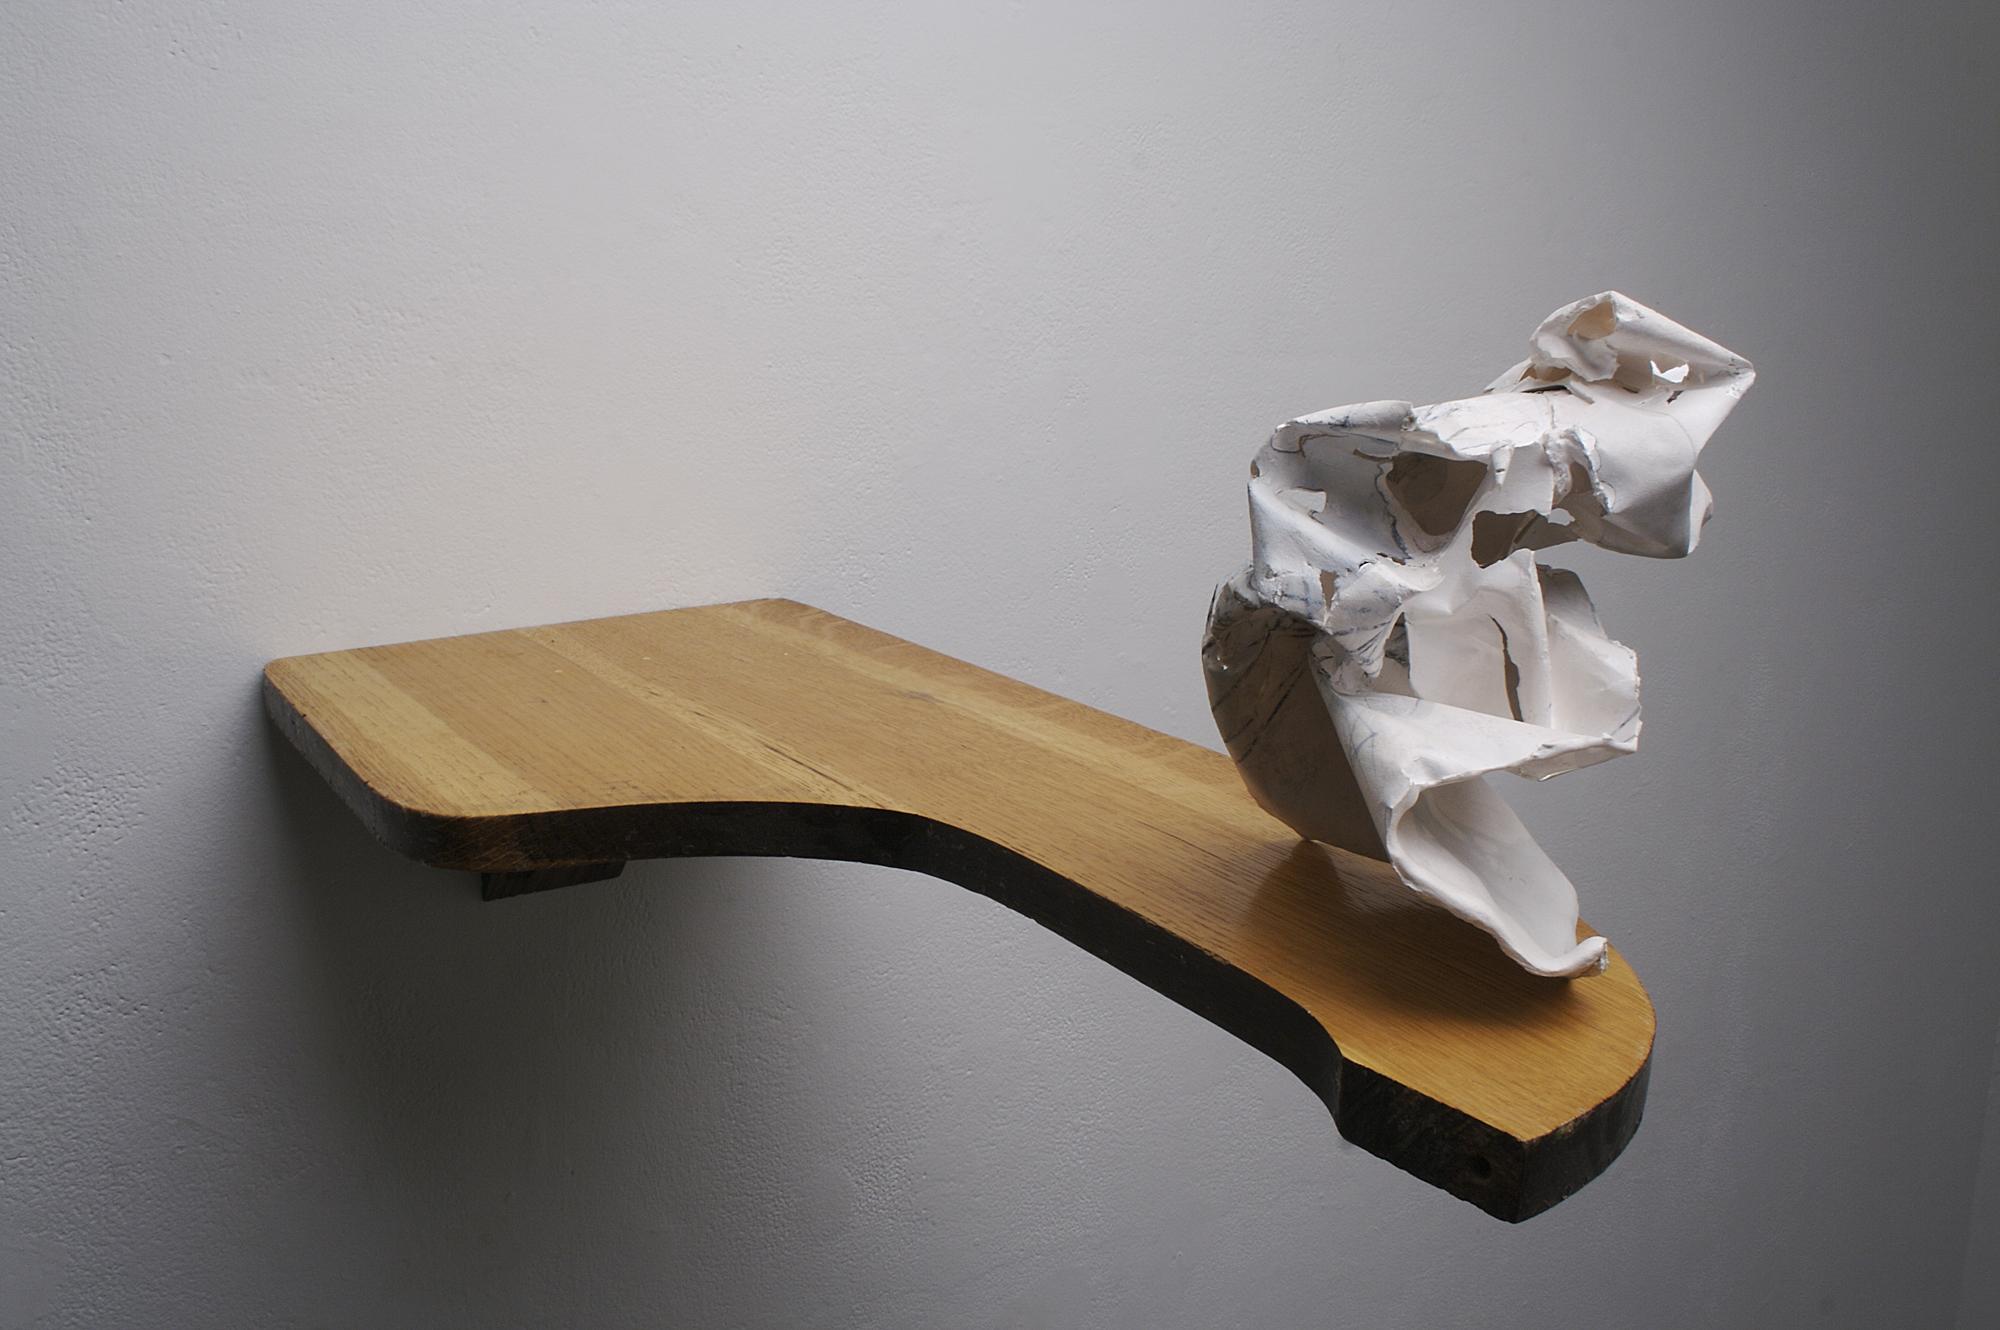 Cast porcelain, underglaze pencil, ceramic decals, desktop.